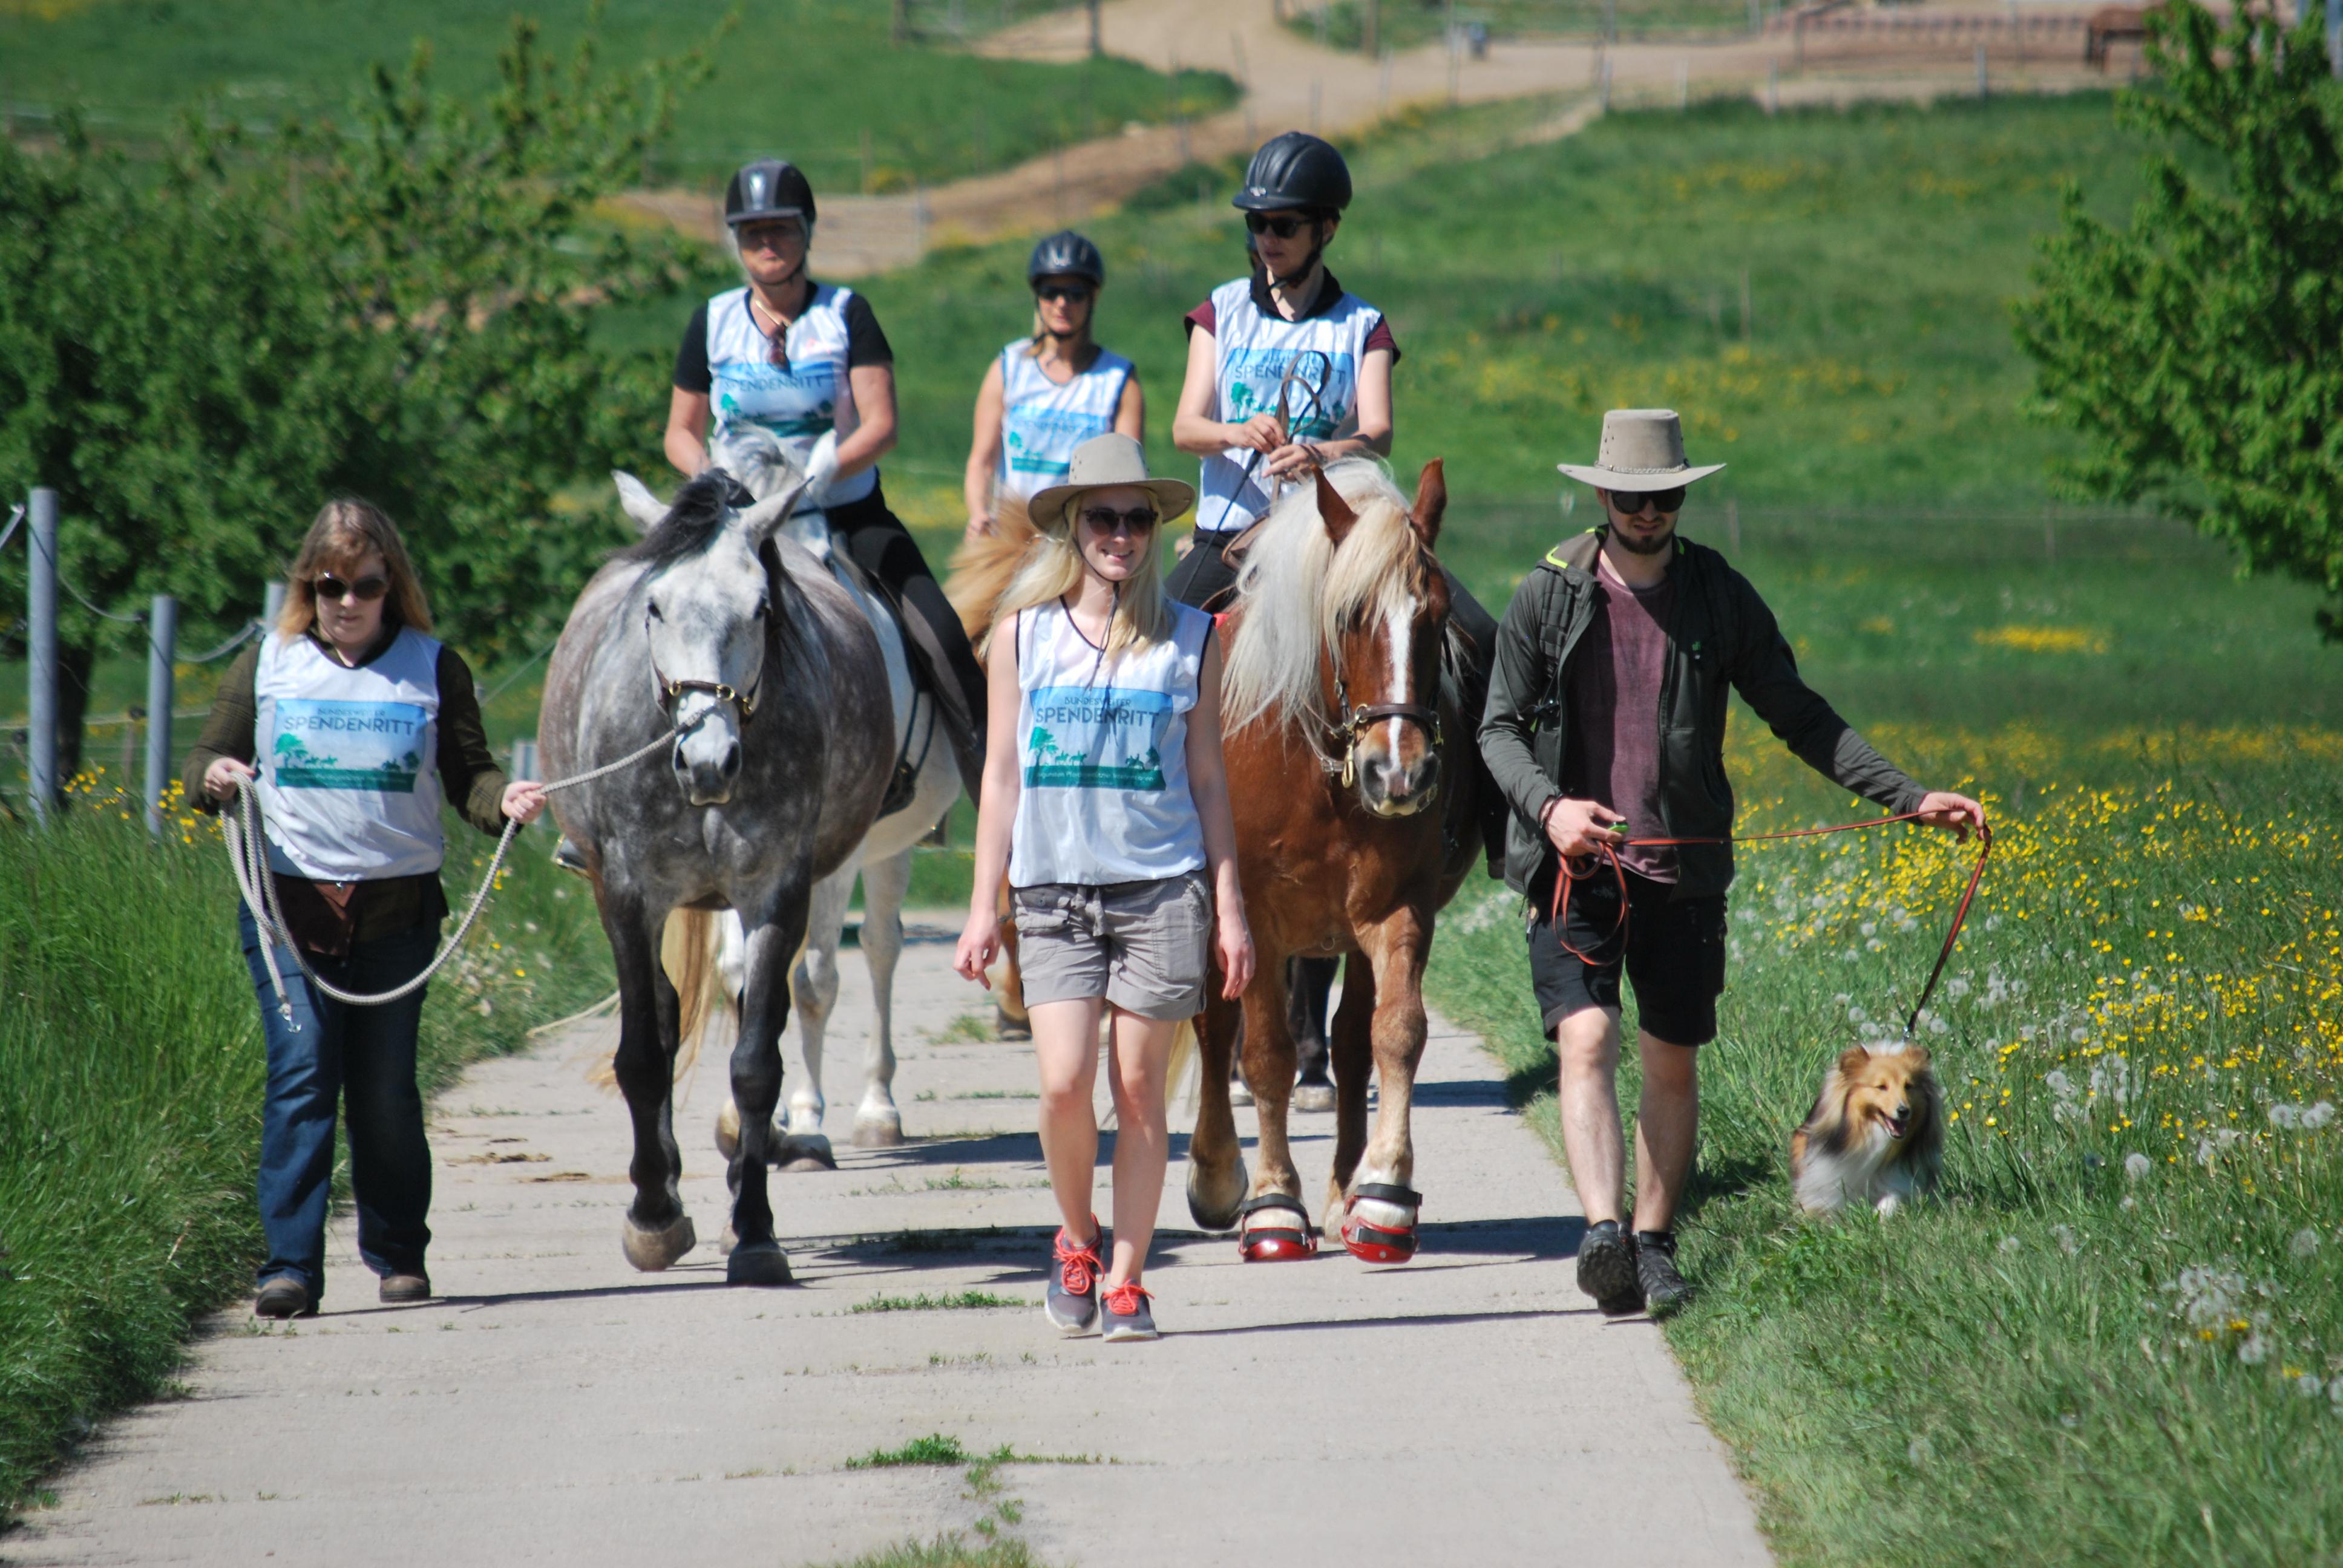 Antje Seeber – Spendenritt – Pferdegestützten Interventionen